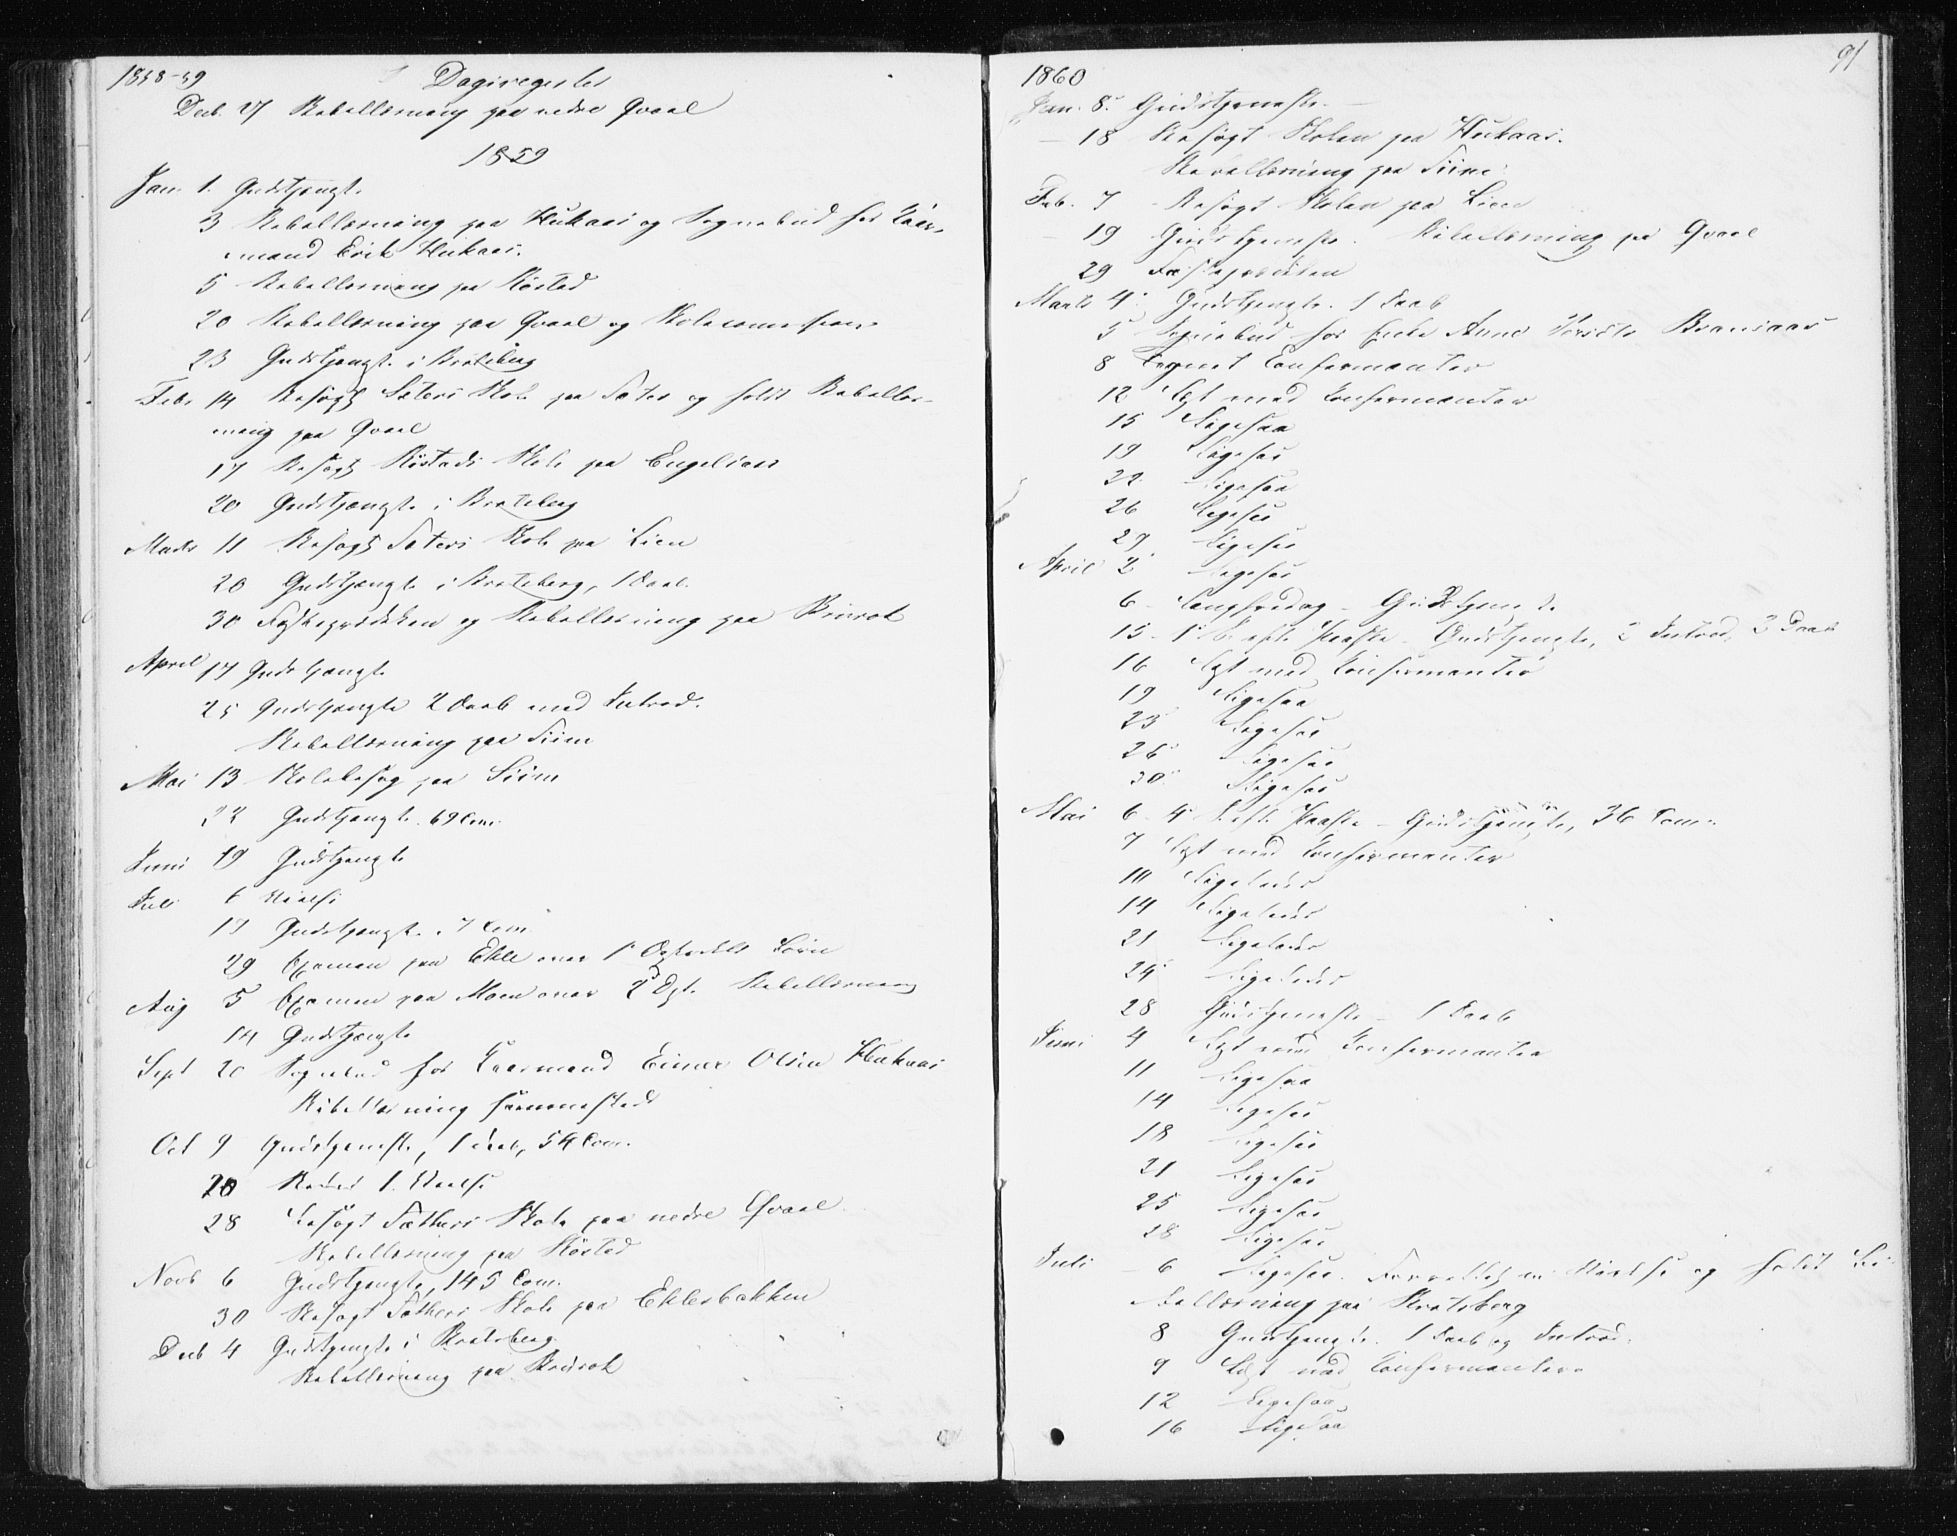 SAT, Ministerialprotokoller, klokkerbøker og fødselsregistre - Sør-Trøndelag, 608/L0332: Parish register (official) no. 608A01, 1848-1861, p. 91